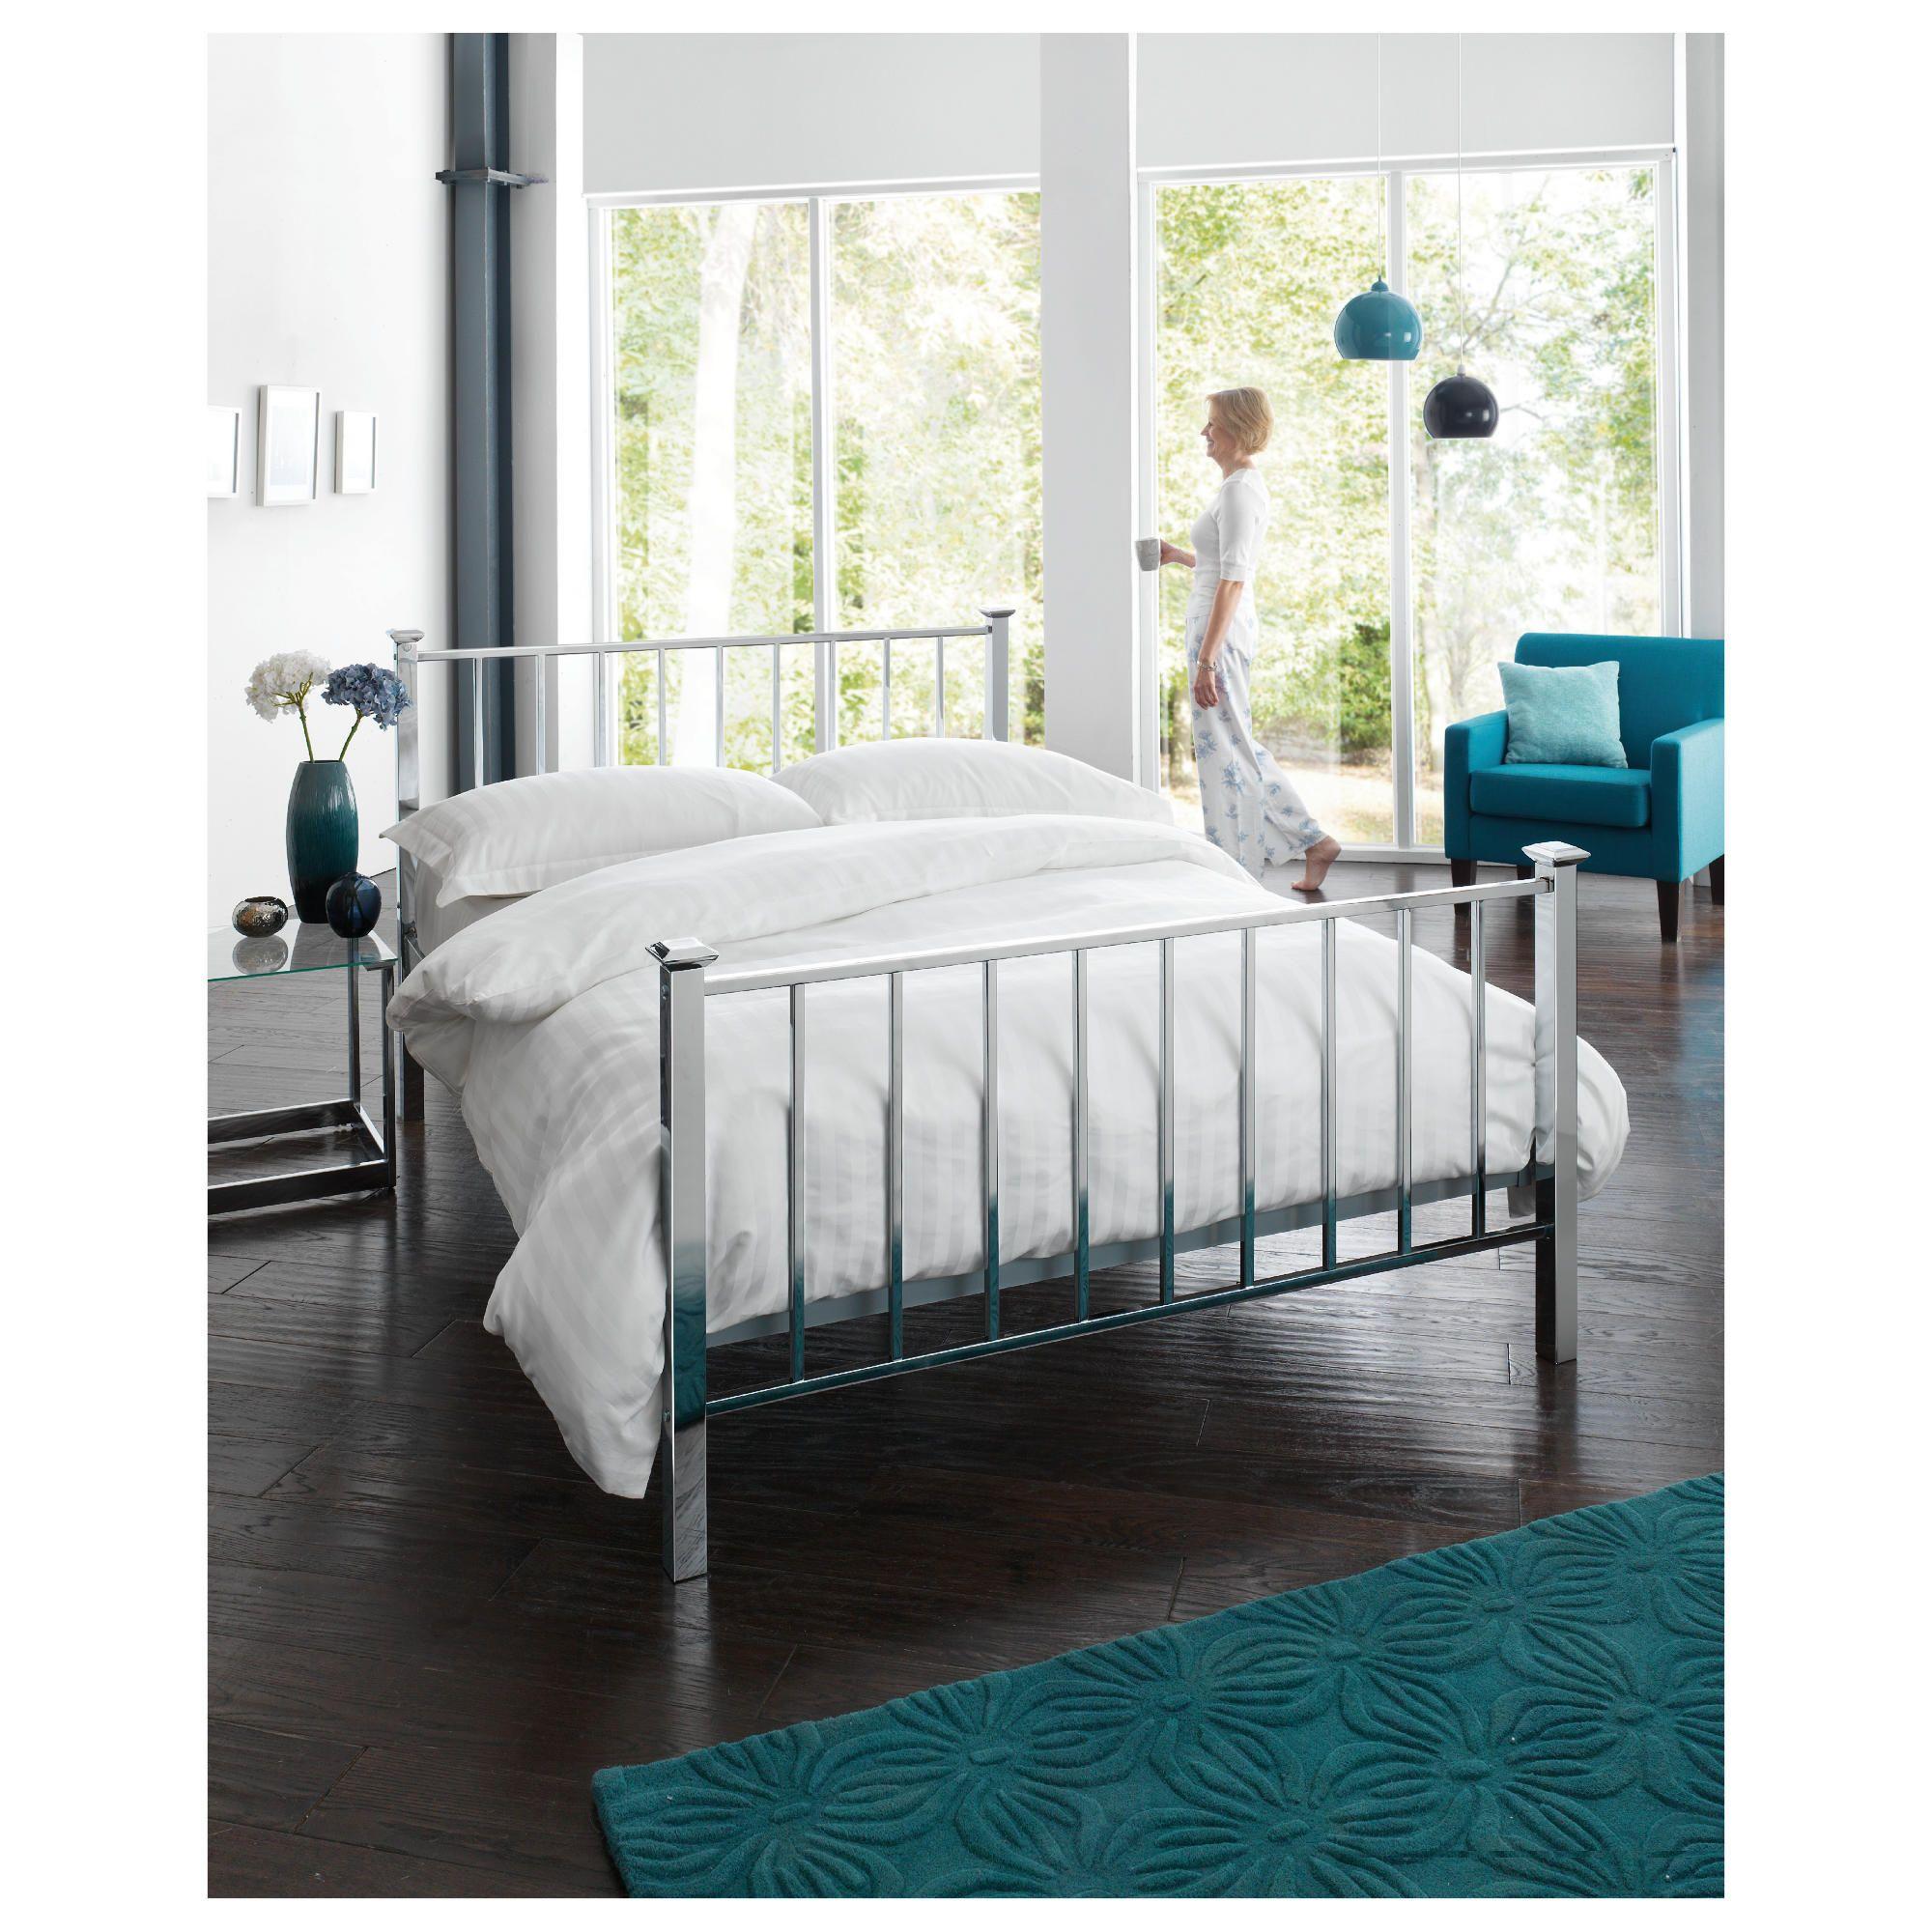 Monaco Double Bed Frame, Chrome at Tesco Direct